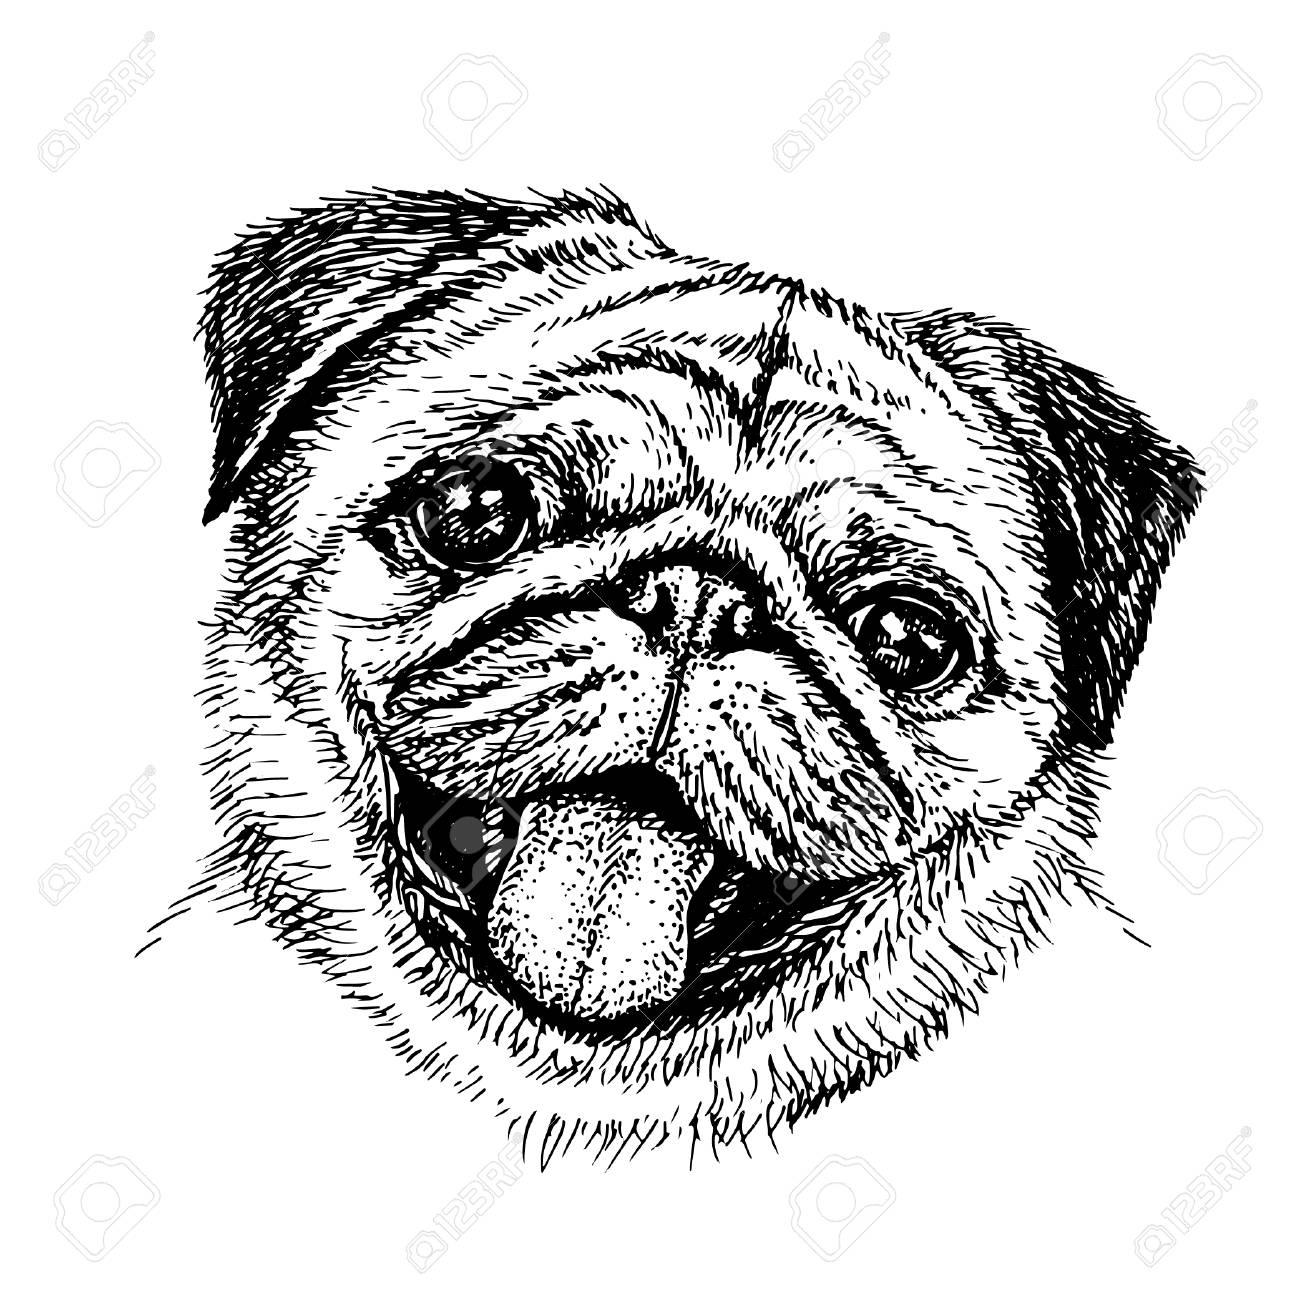 1300x1300 Sketch Dog Cute Pug Illustration. Royalty Free Cliparts, Vectors